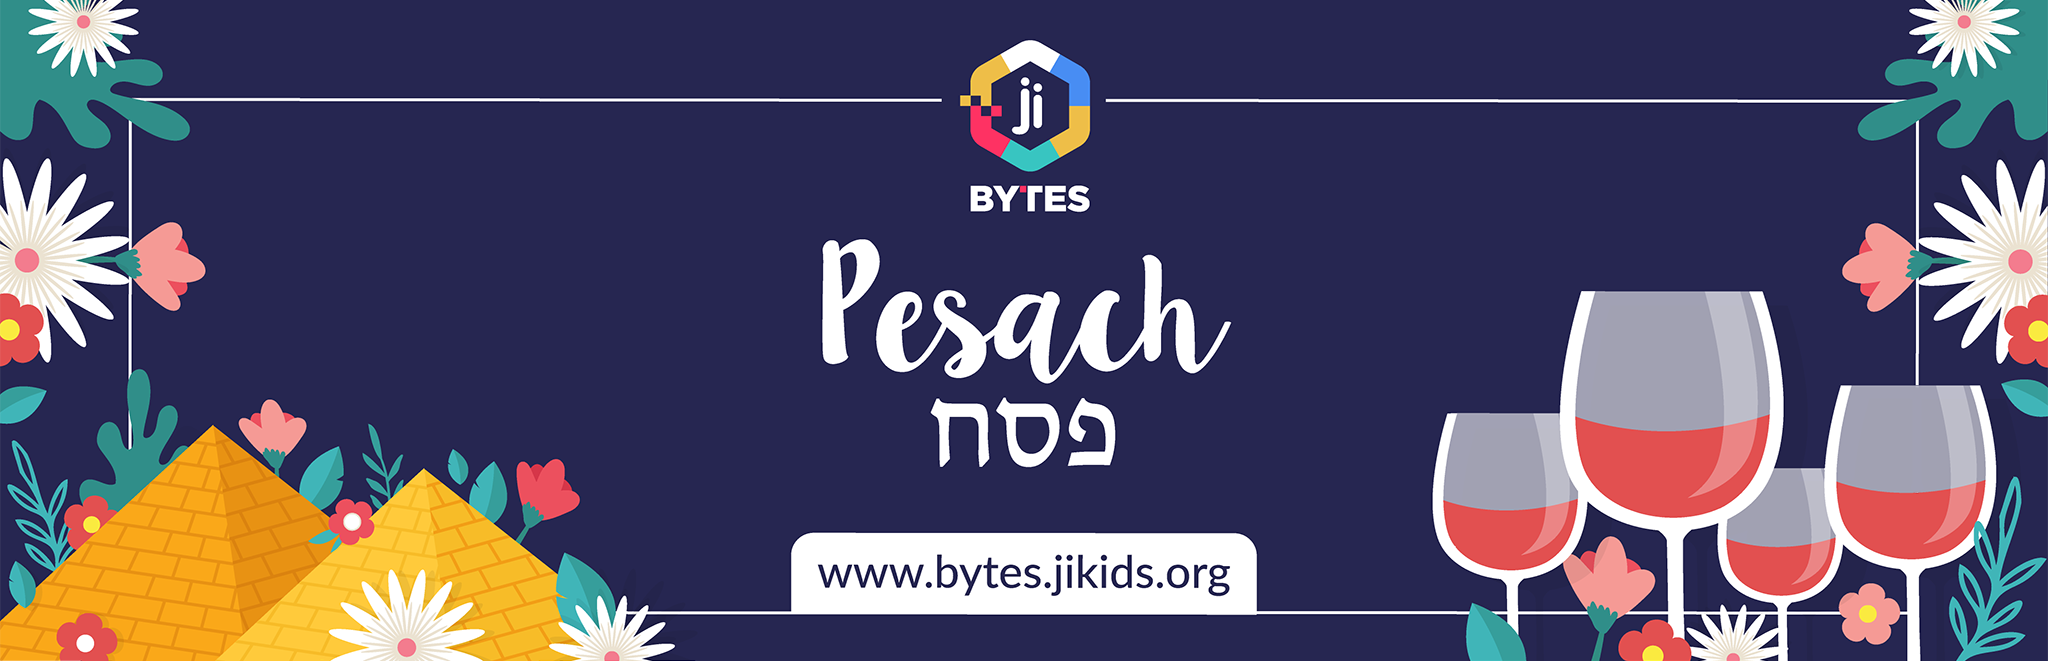 bytes_pesach_landing